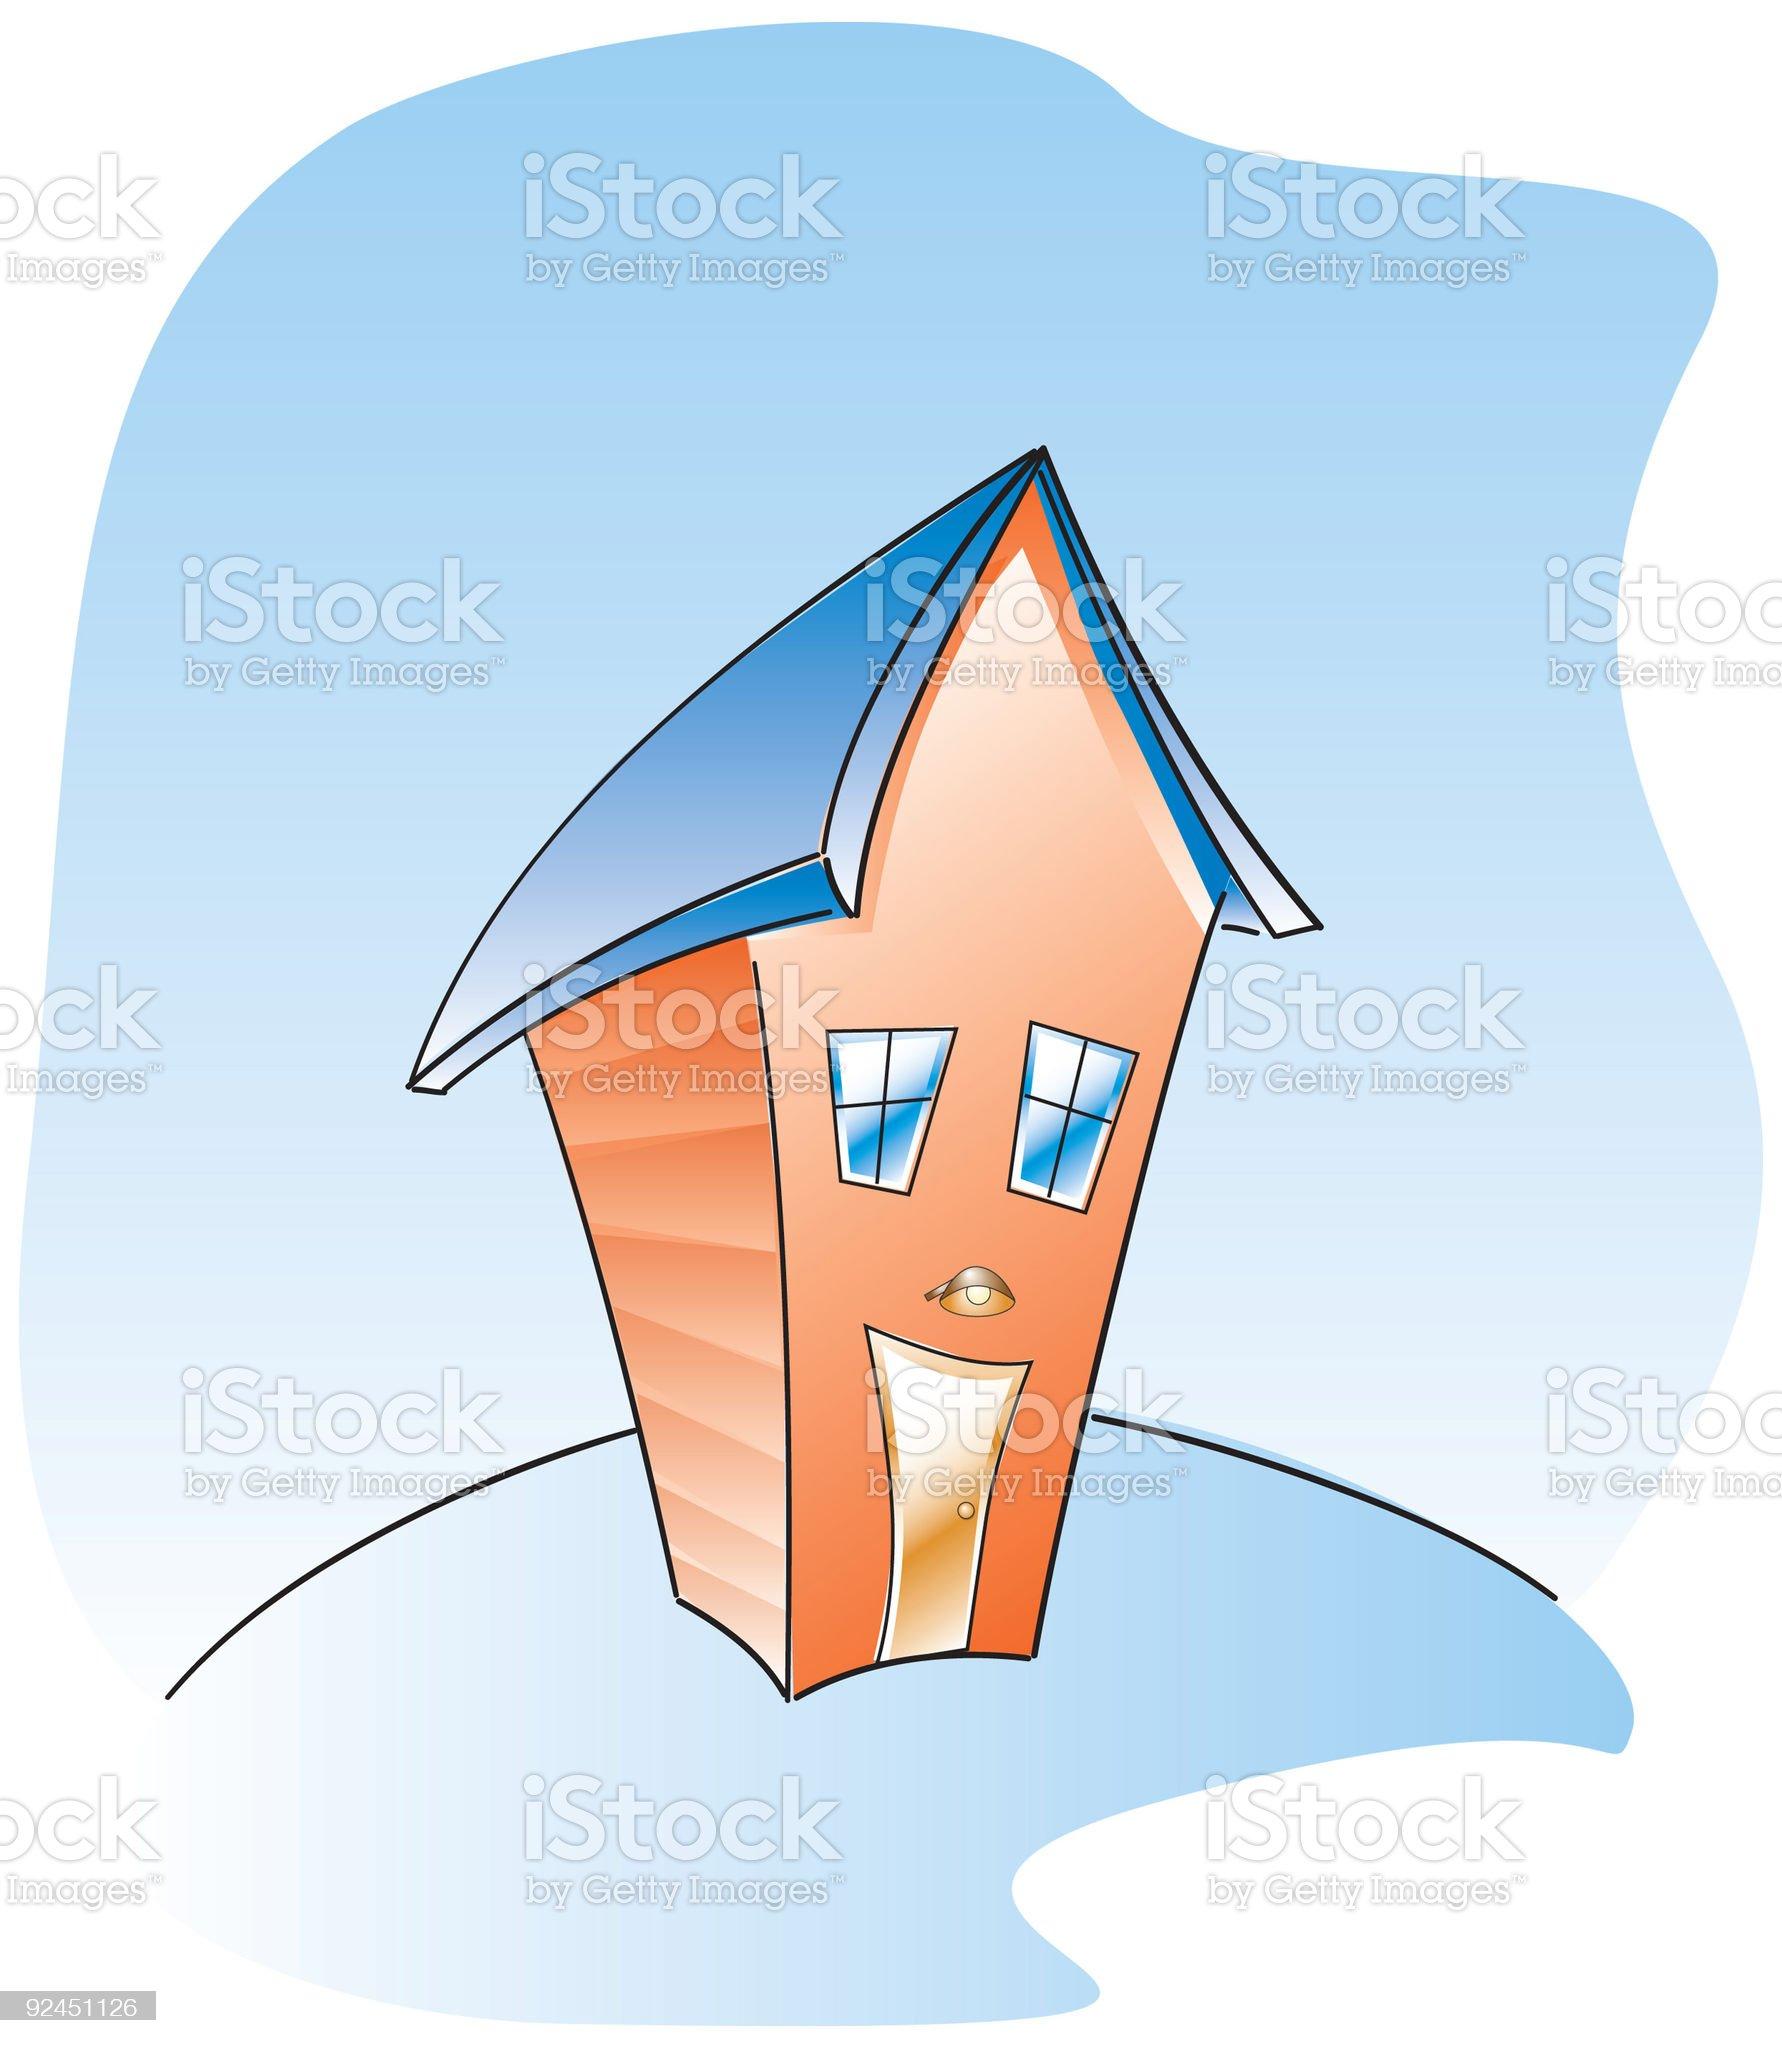 skinny house royalty-free stock vector art